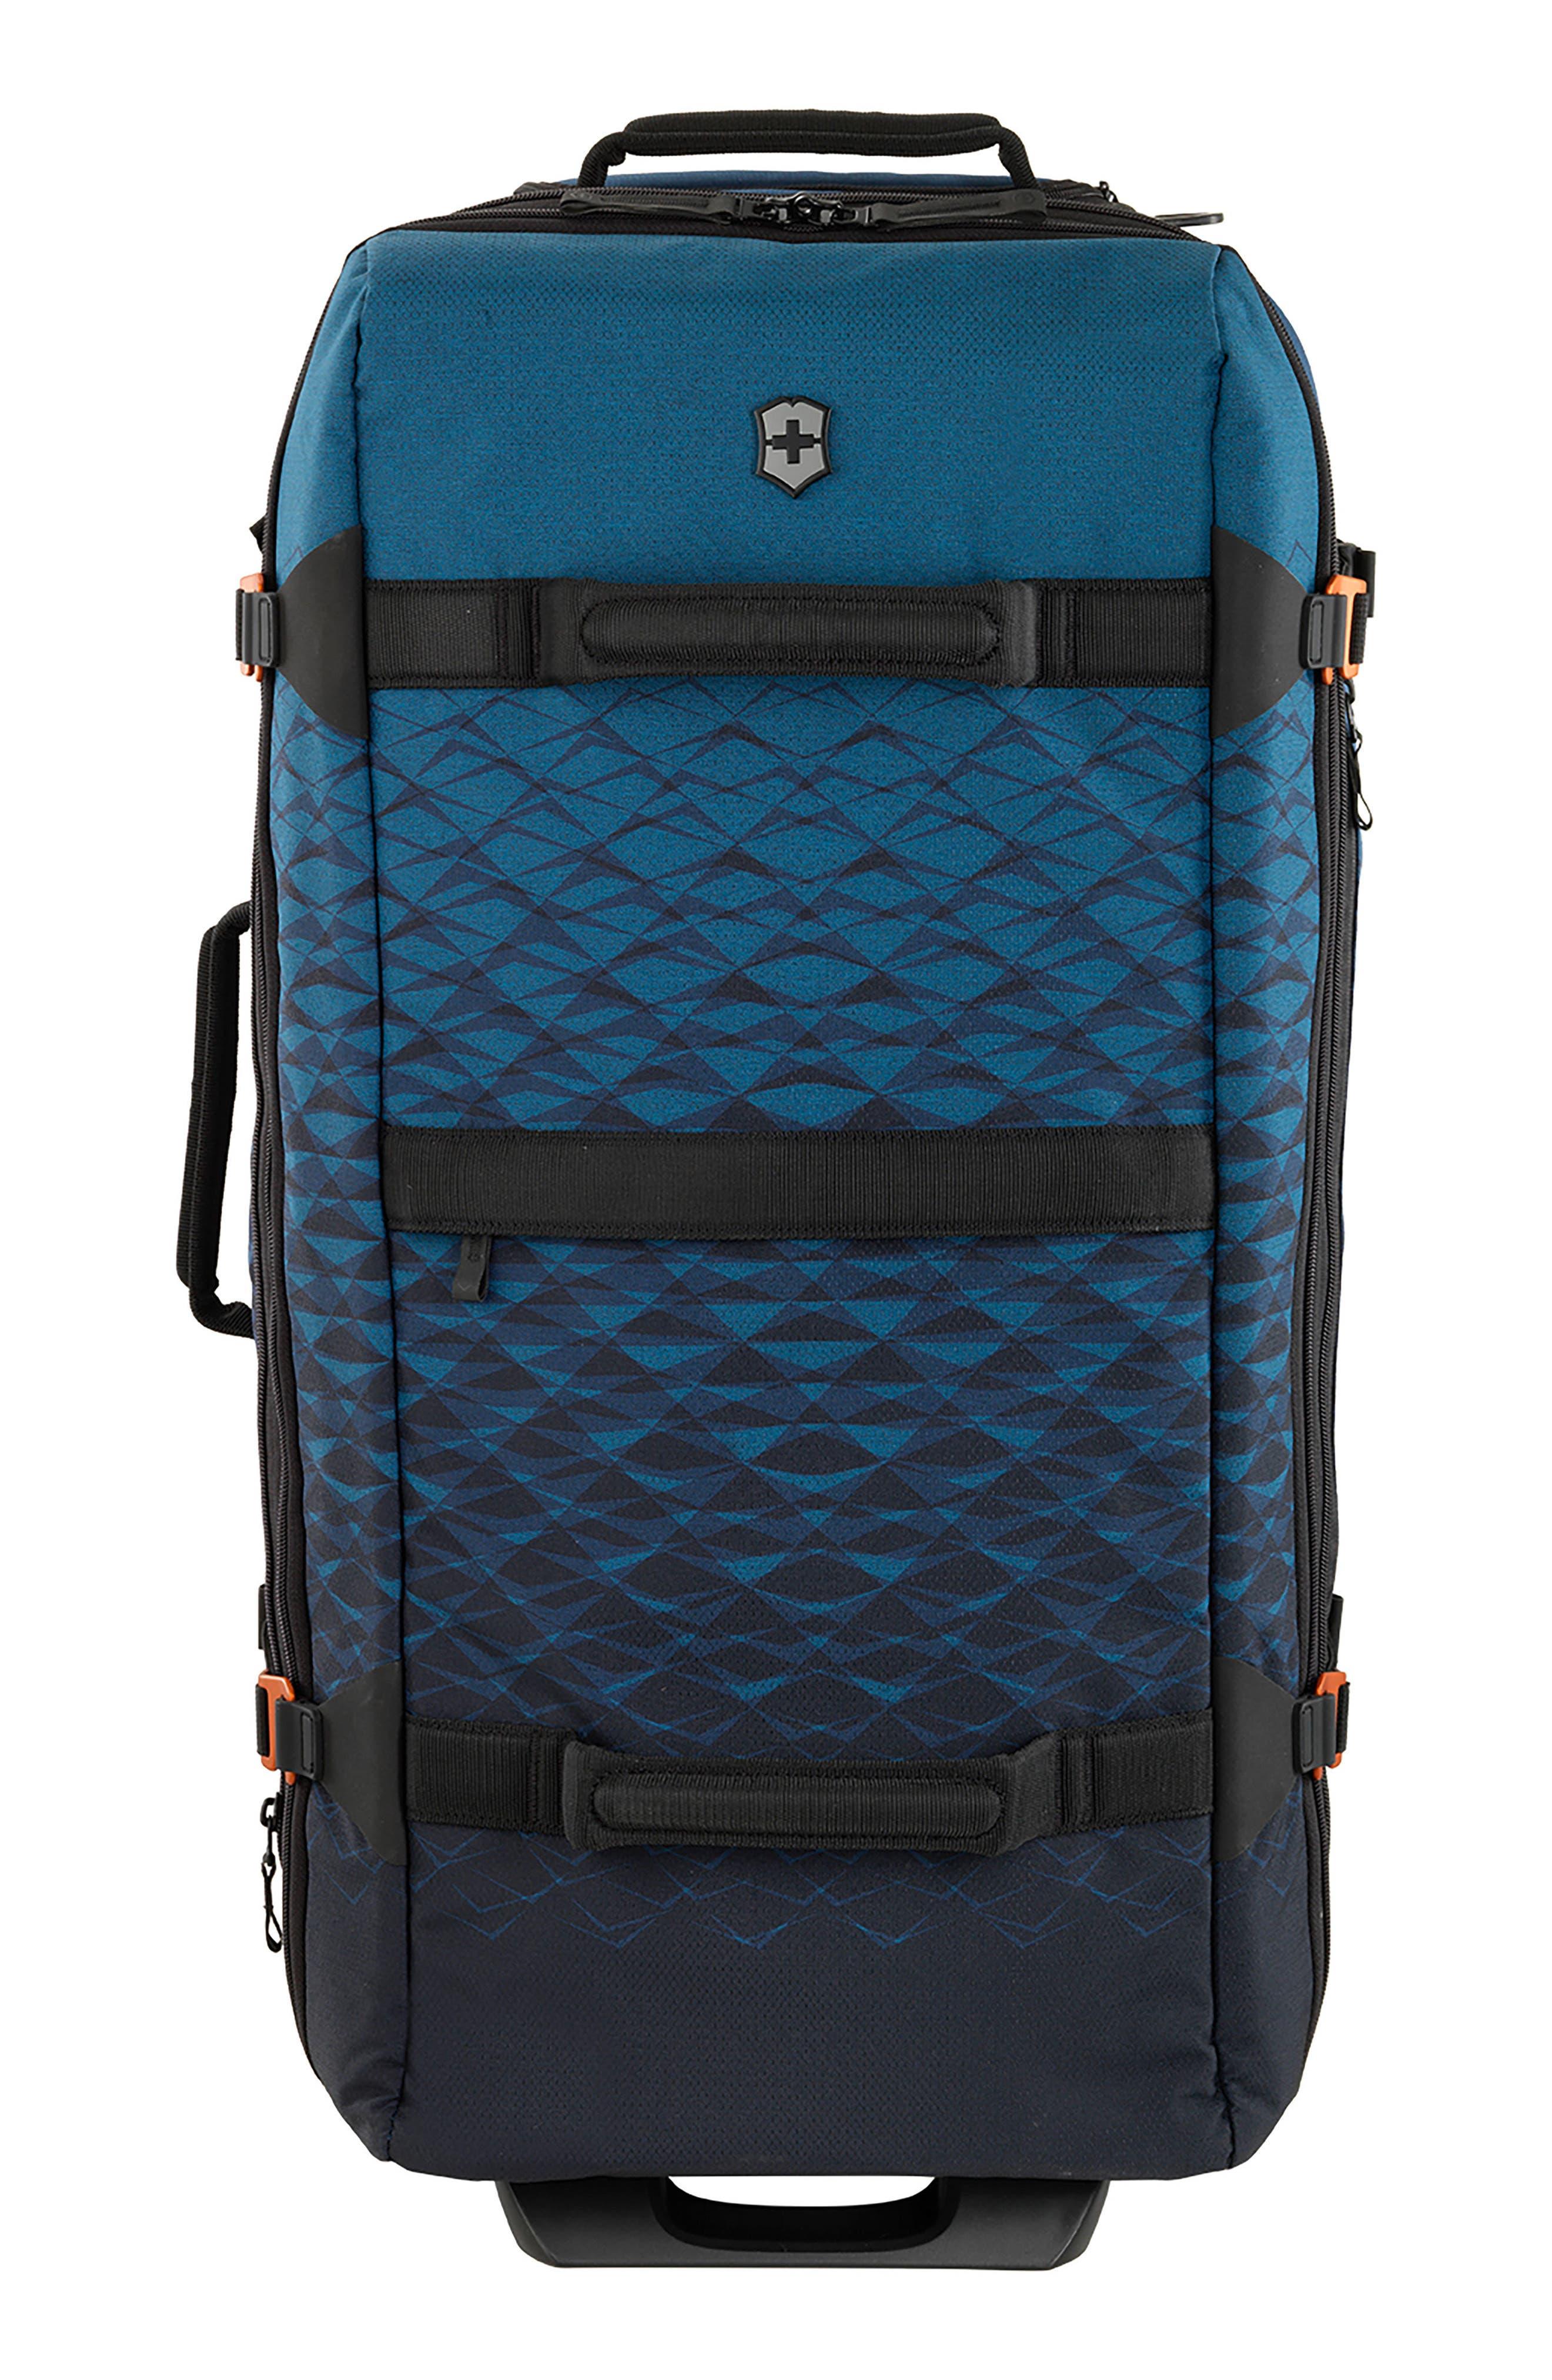 VX Touring Large Wheeled Duffel Bag,                         Main,                         color, Dark Teal